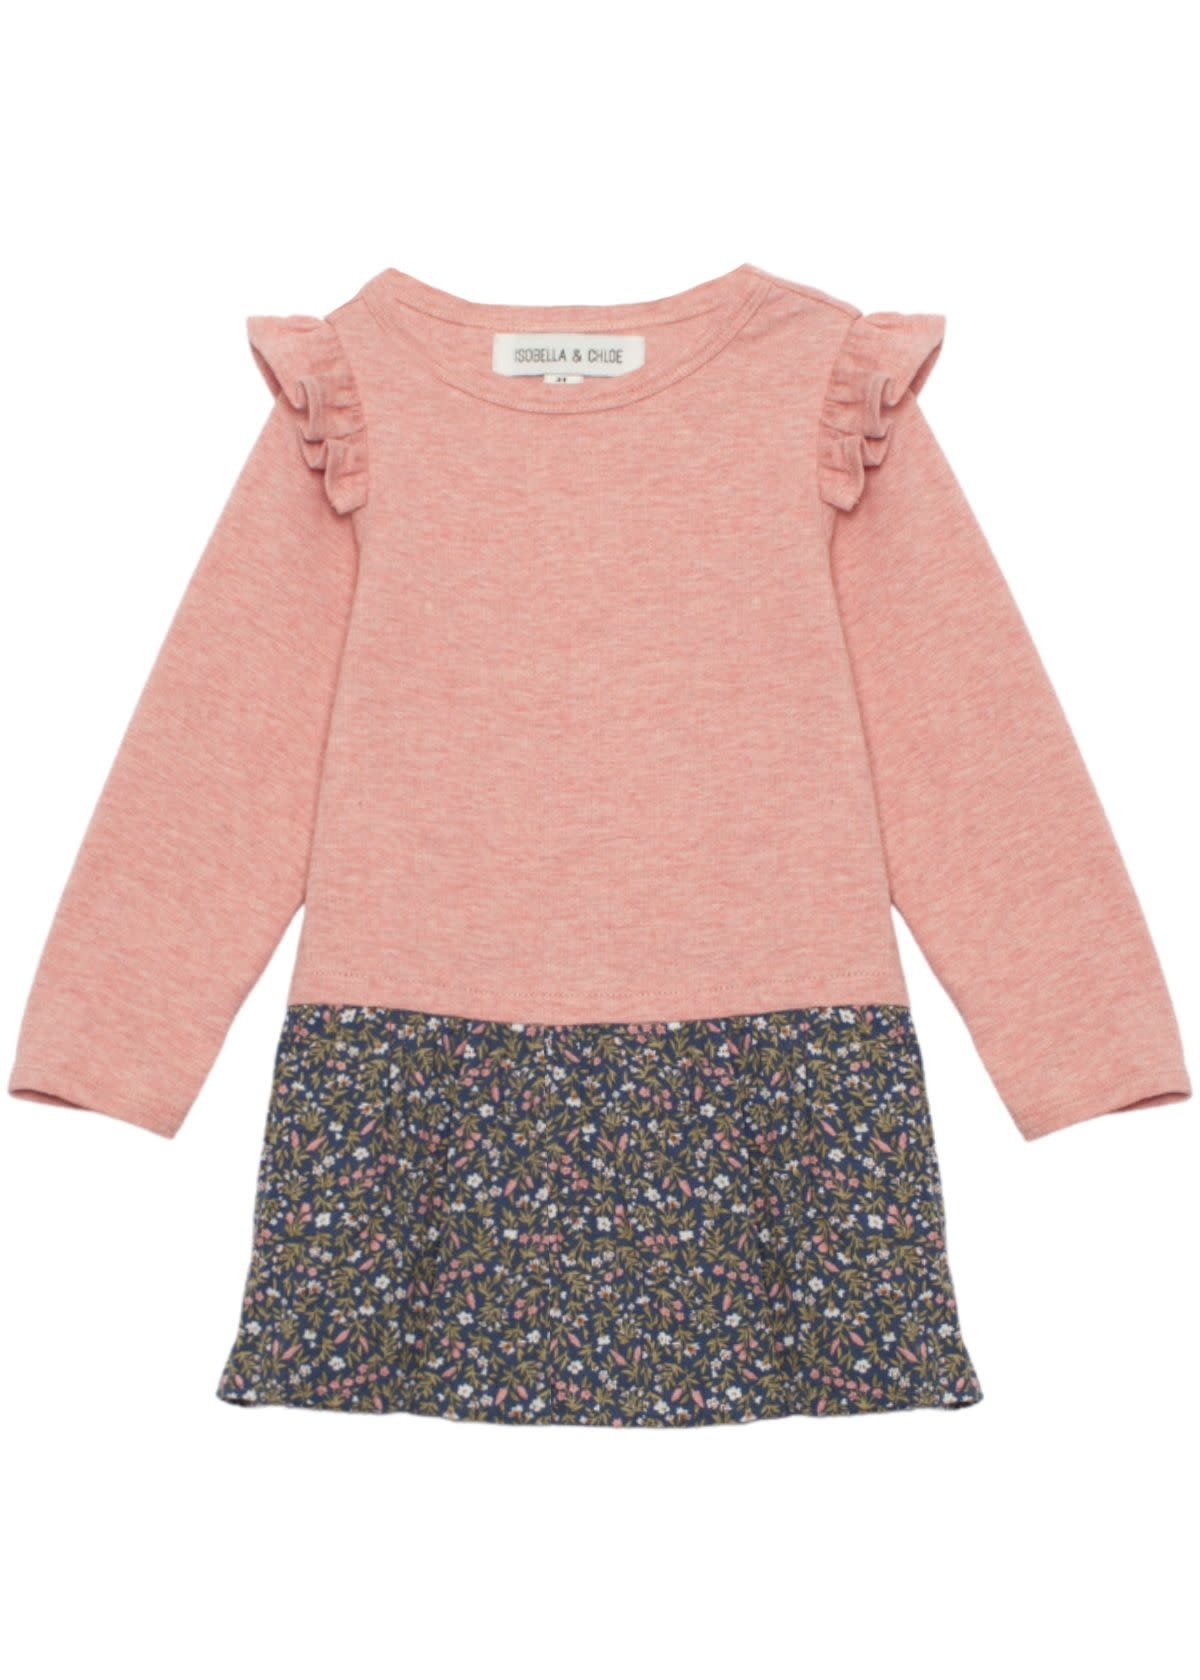 Isobella & Chloe Blossom Knit Dress